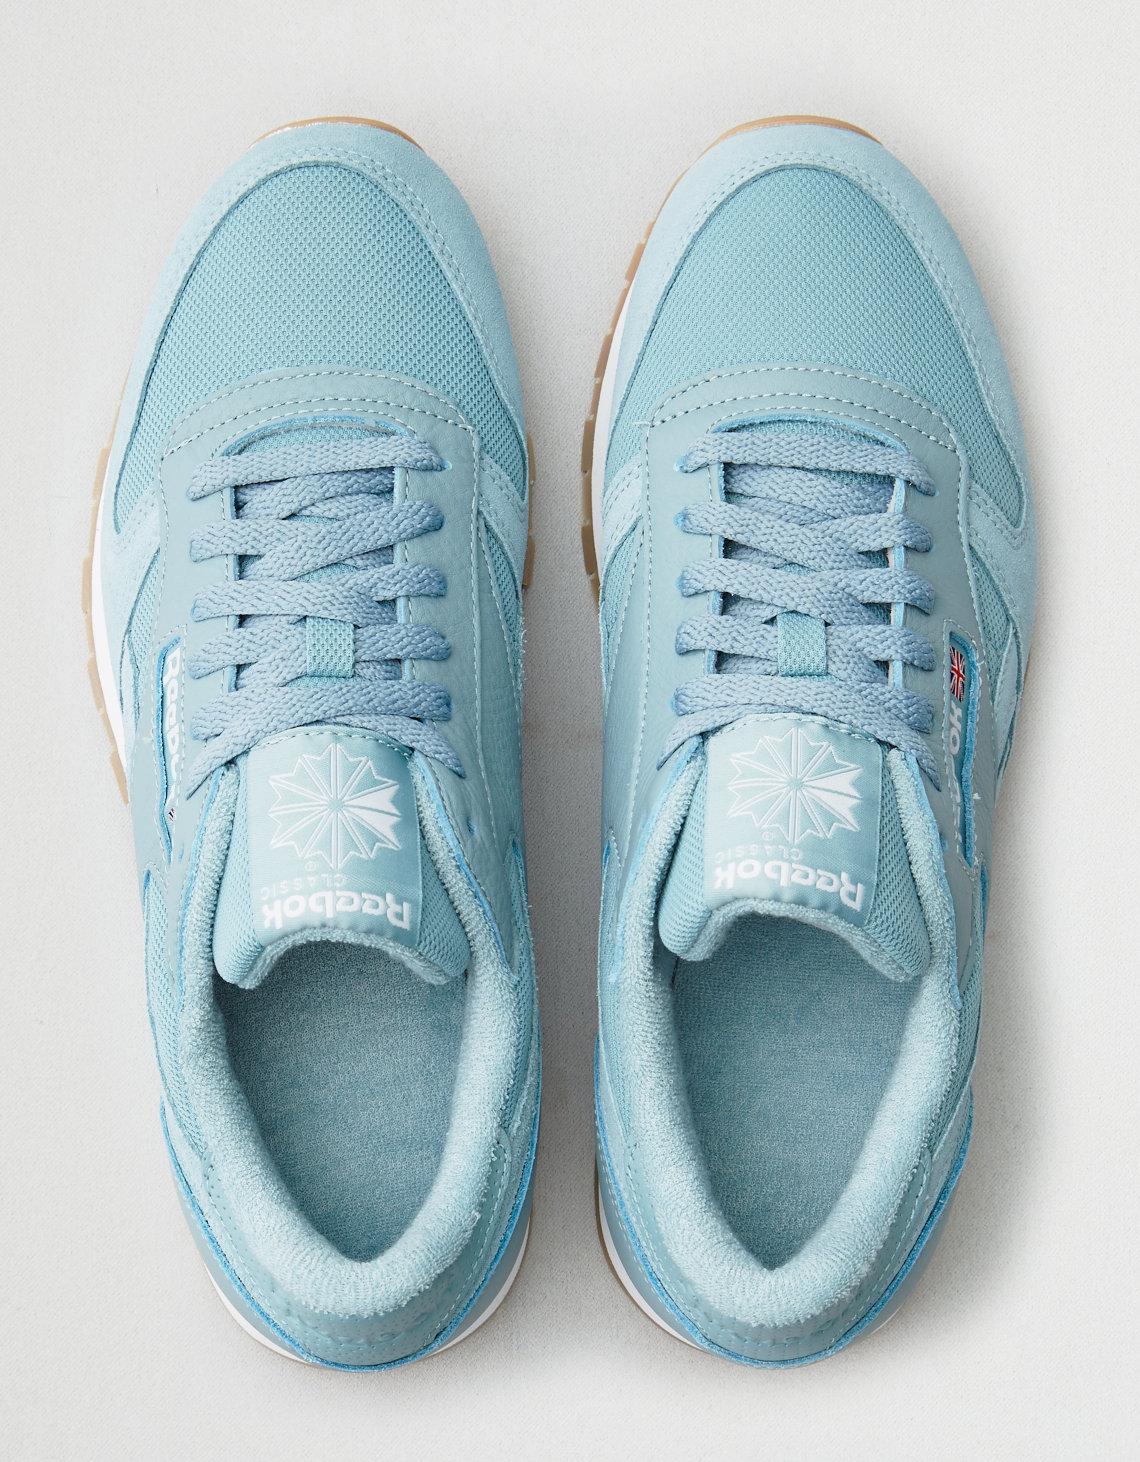 b35e359a8eb Lyst - American Eagle Reebok Cl Leather Estl Sneaker in Blue for Men